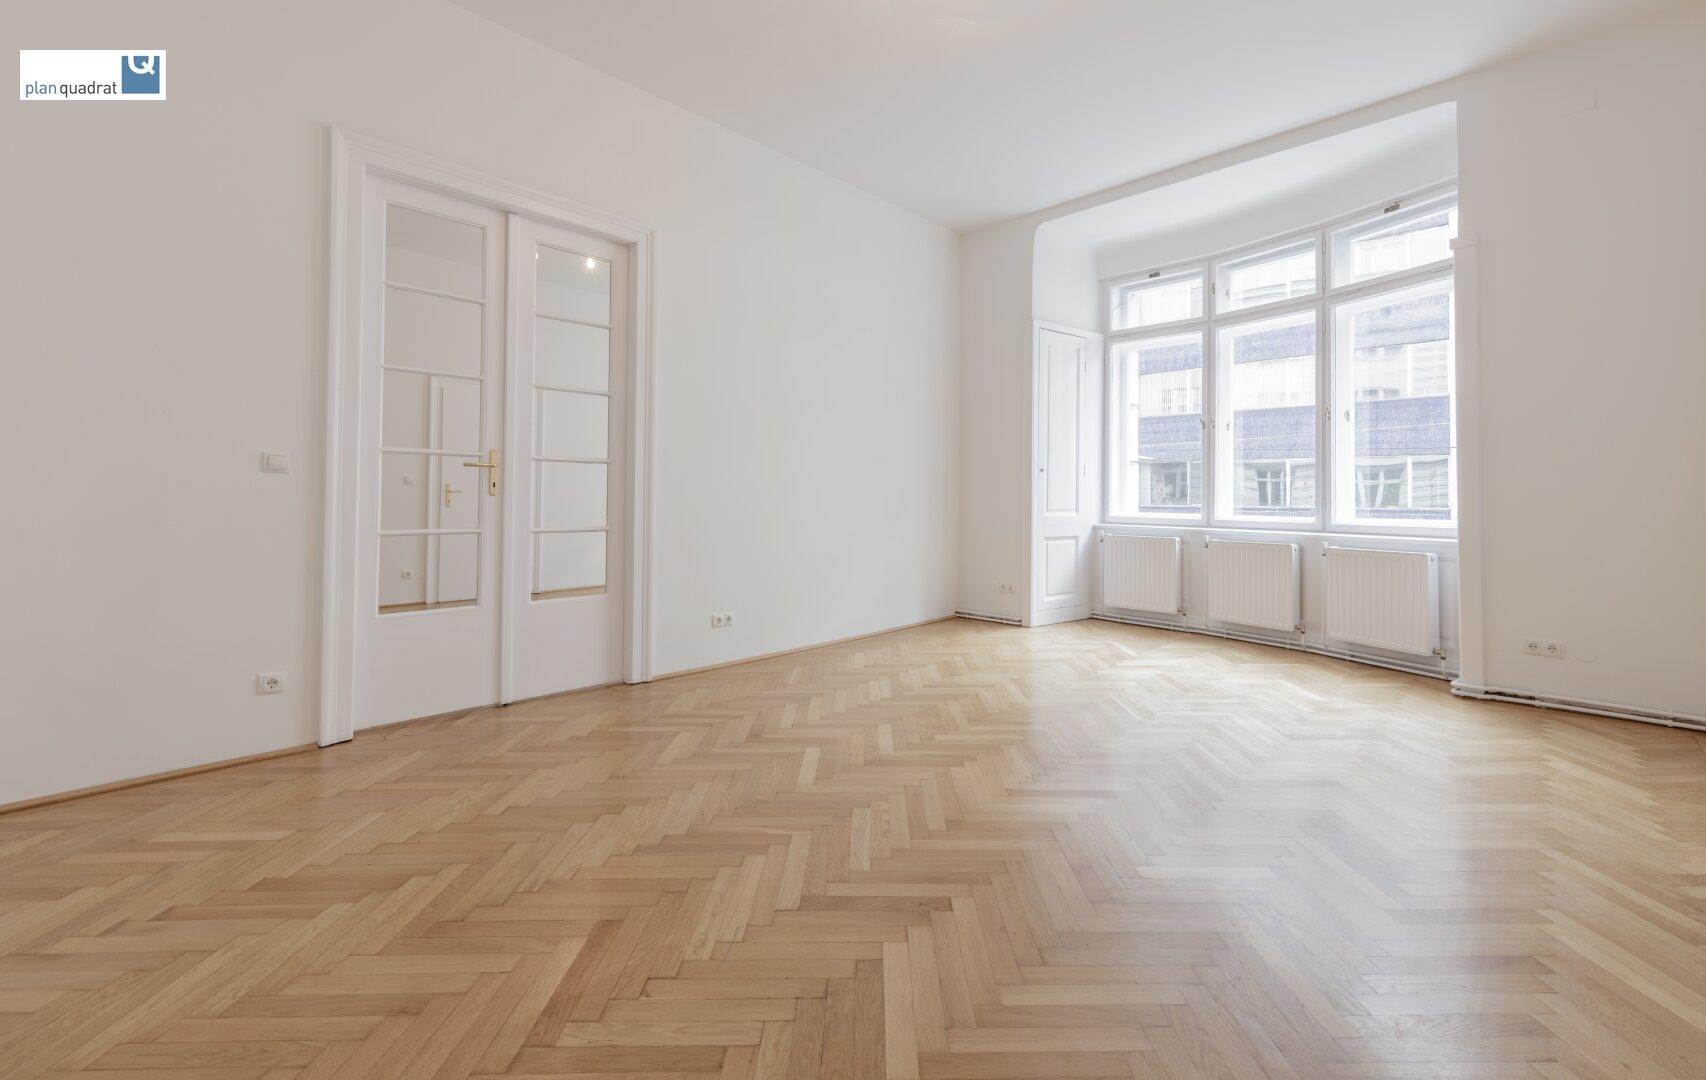 Büroraum 3 (gem. Grundriss - ca. 23,90 qm)